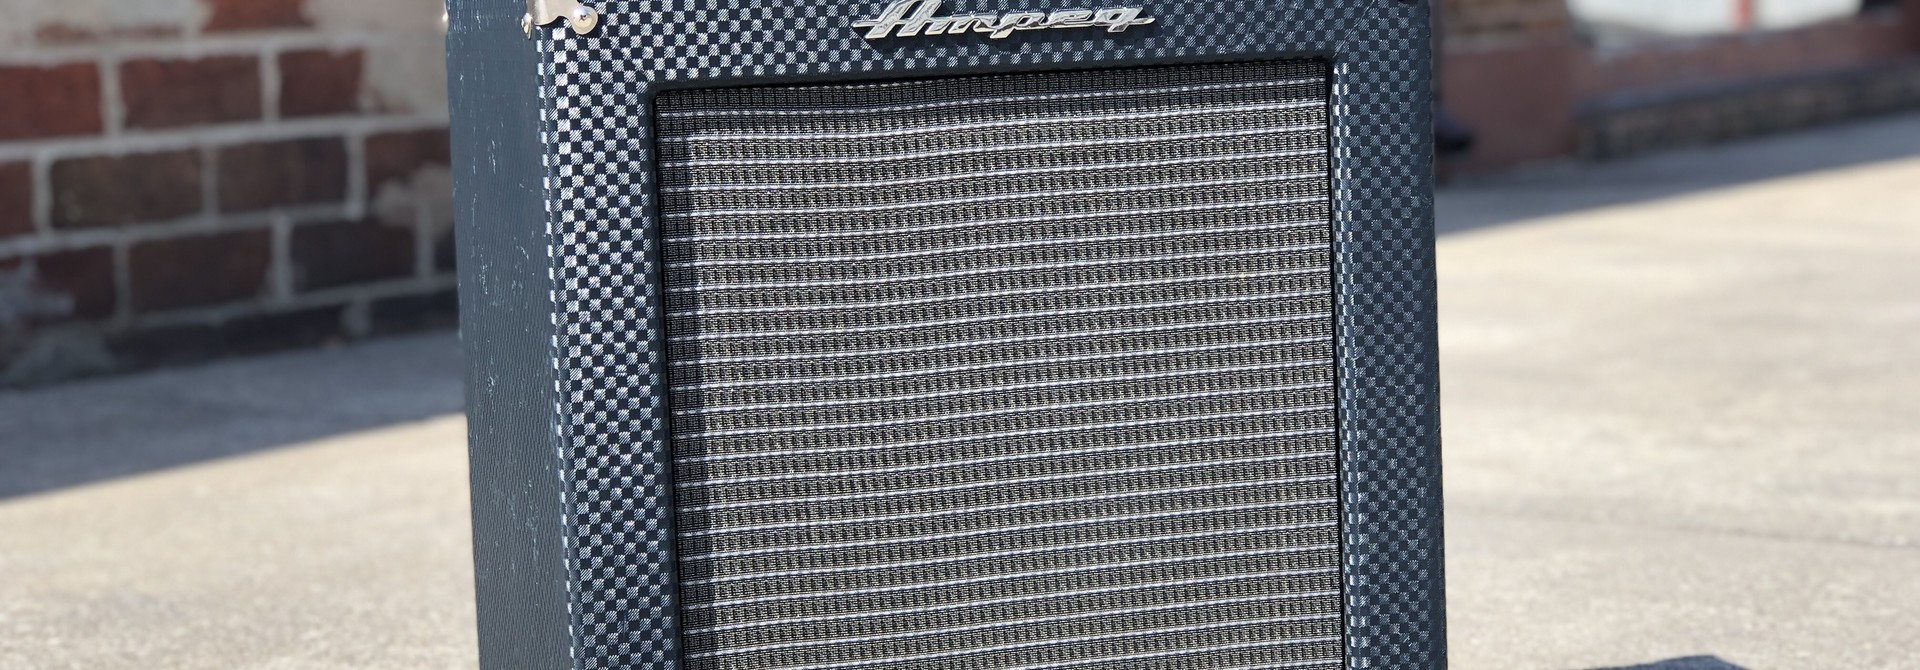 Ampeg B-100R Rocket Bass Amp